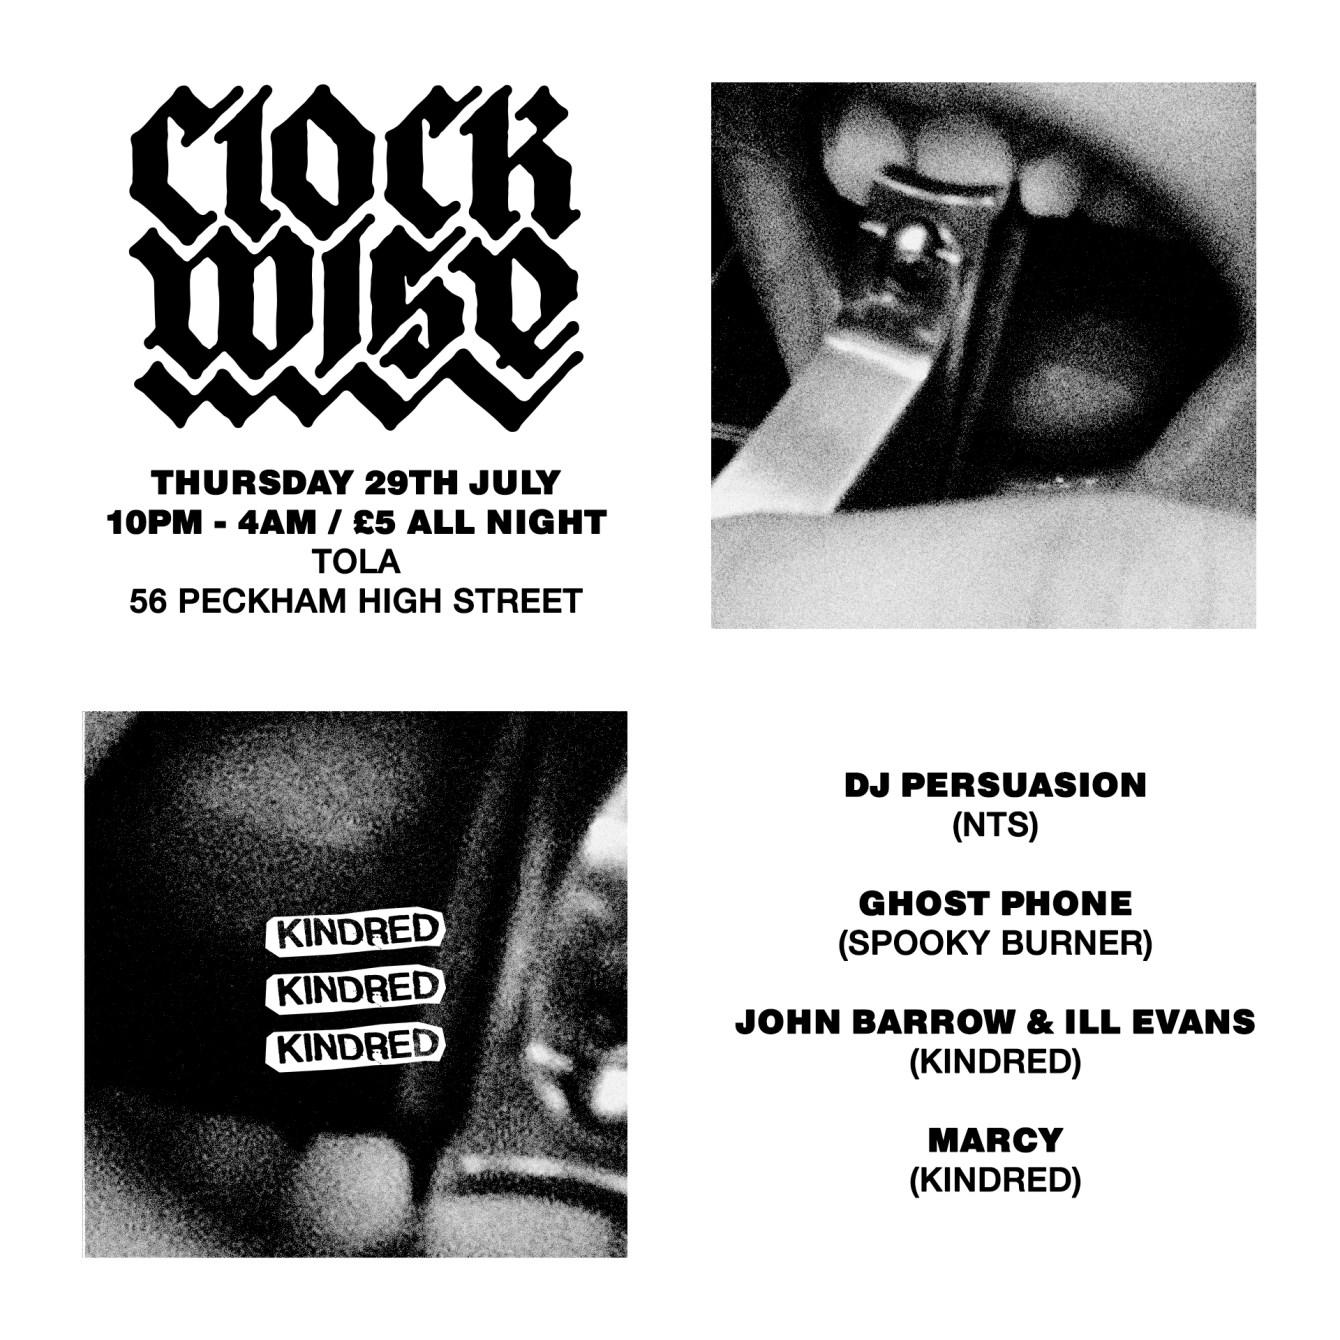 Kindred X Clockwise: DJ Persuasion + Ghost Phone + ILL Evans B2B John Barrow + Marcy - Flyer back